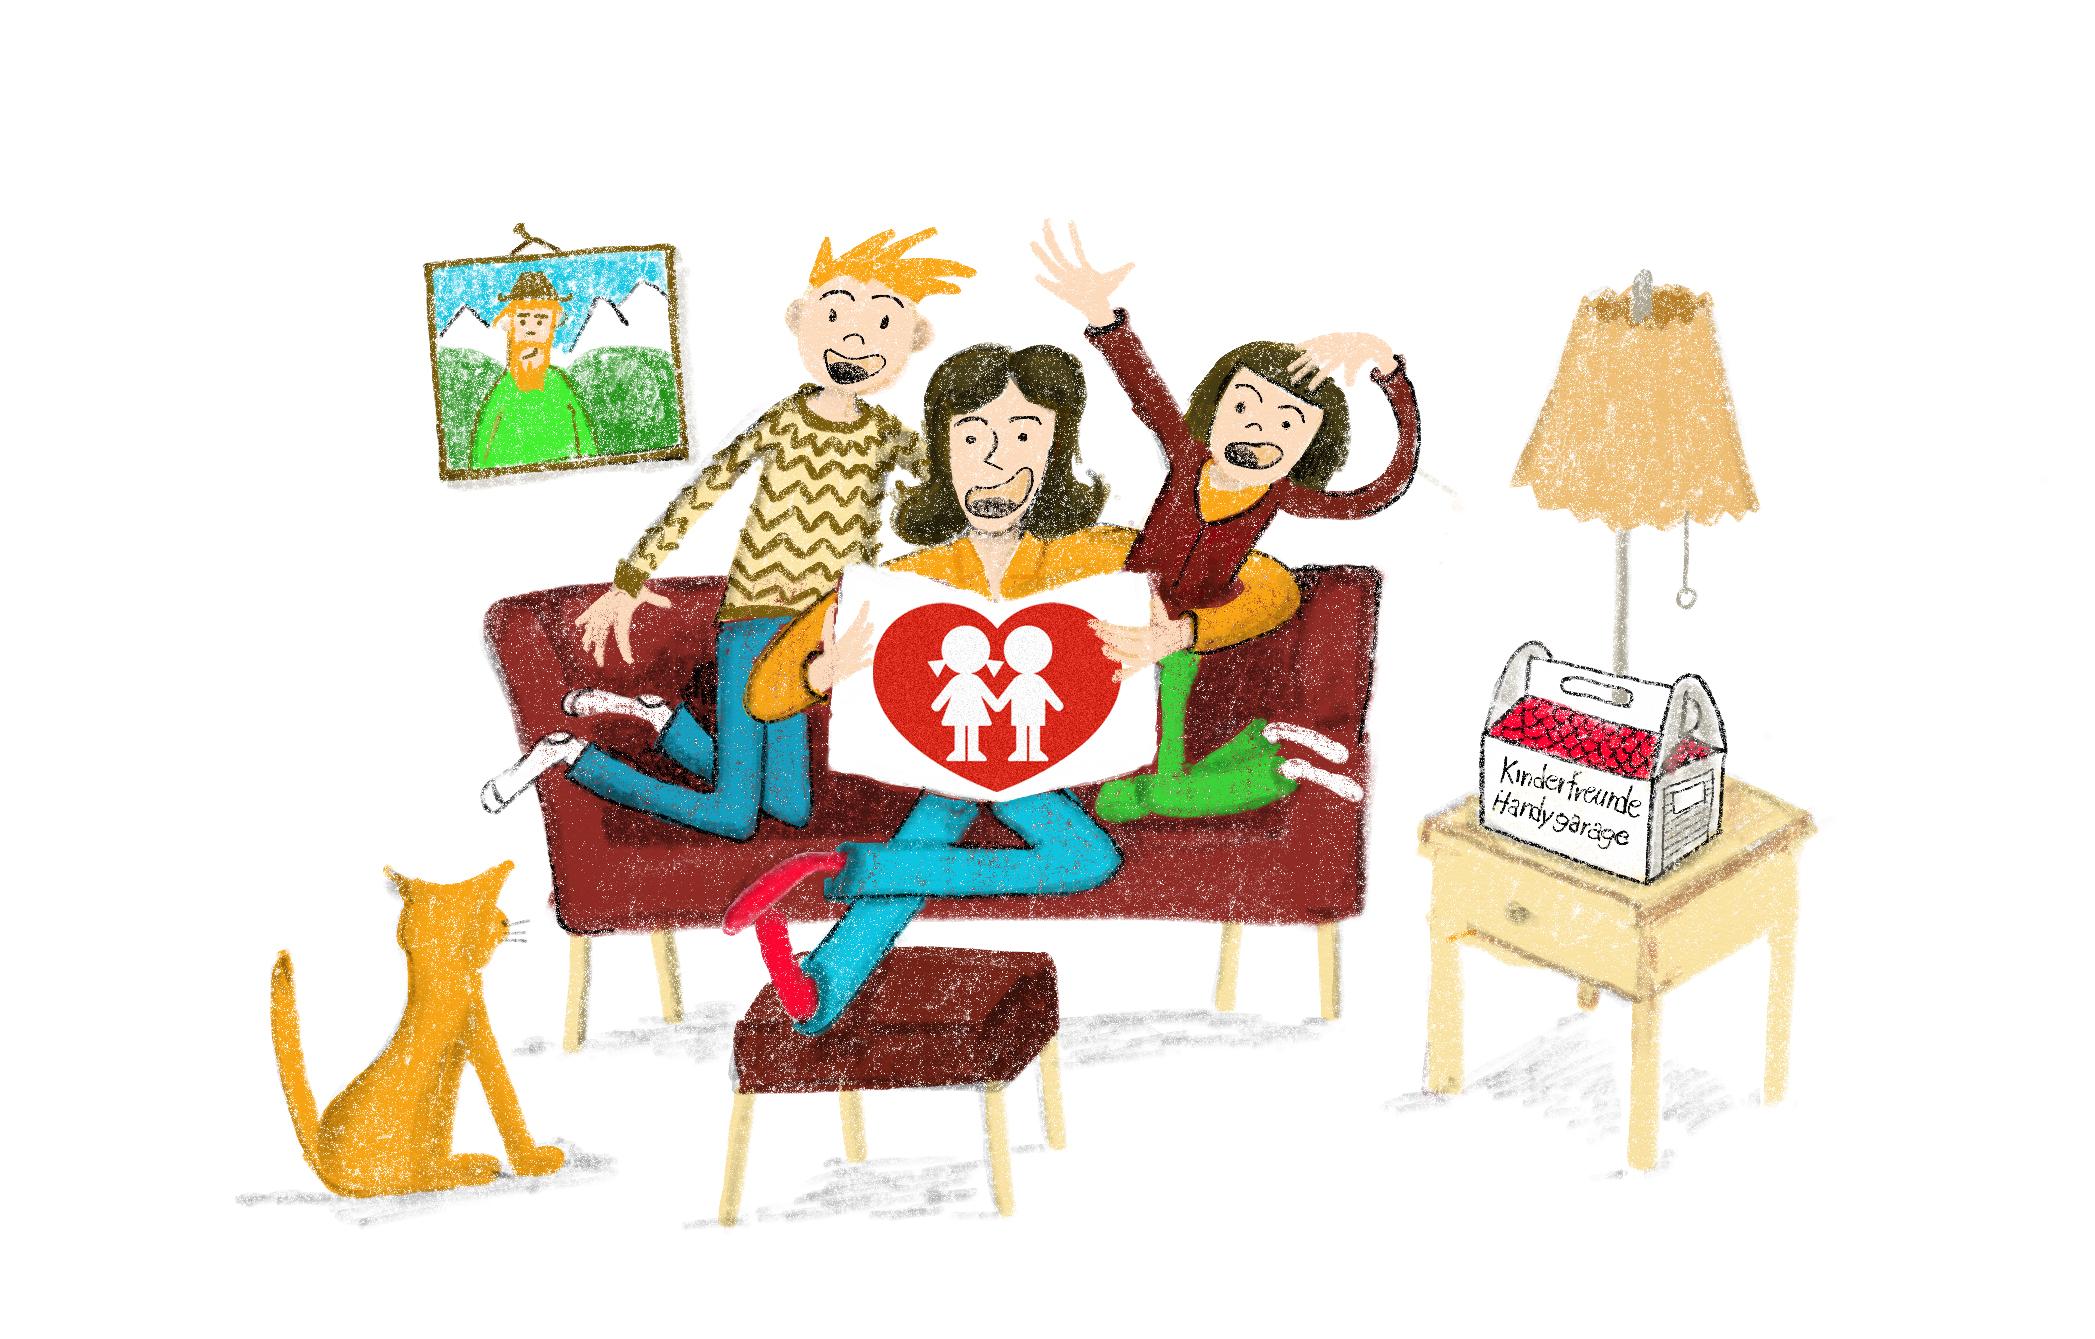 Die Familie ließt – Illustration Wir Lesen Familie Kinderfreunde Oberösterreich © Martin Bruner Sombrero Design